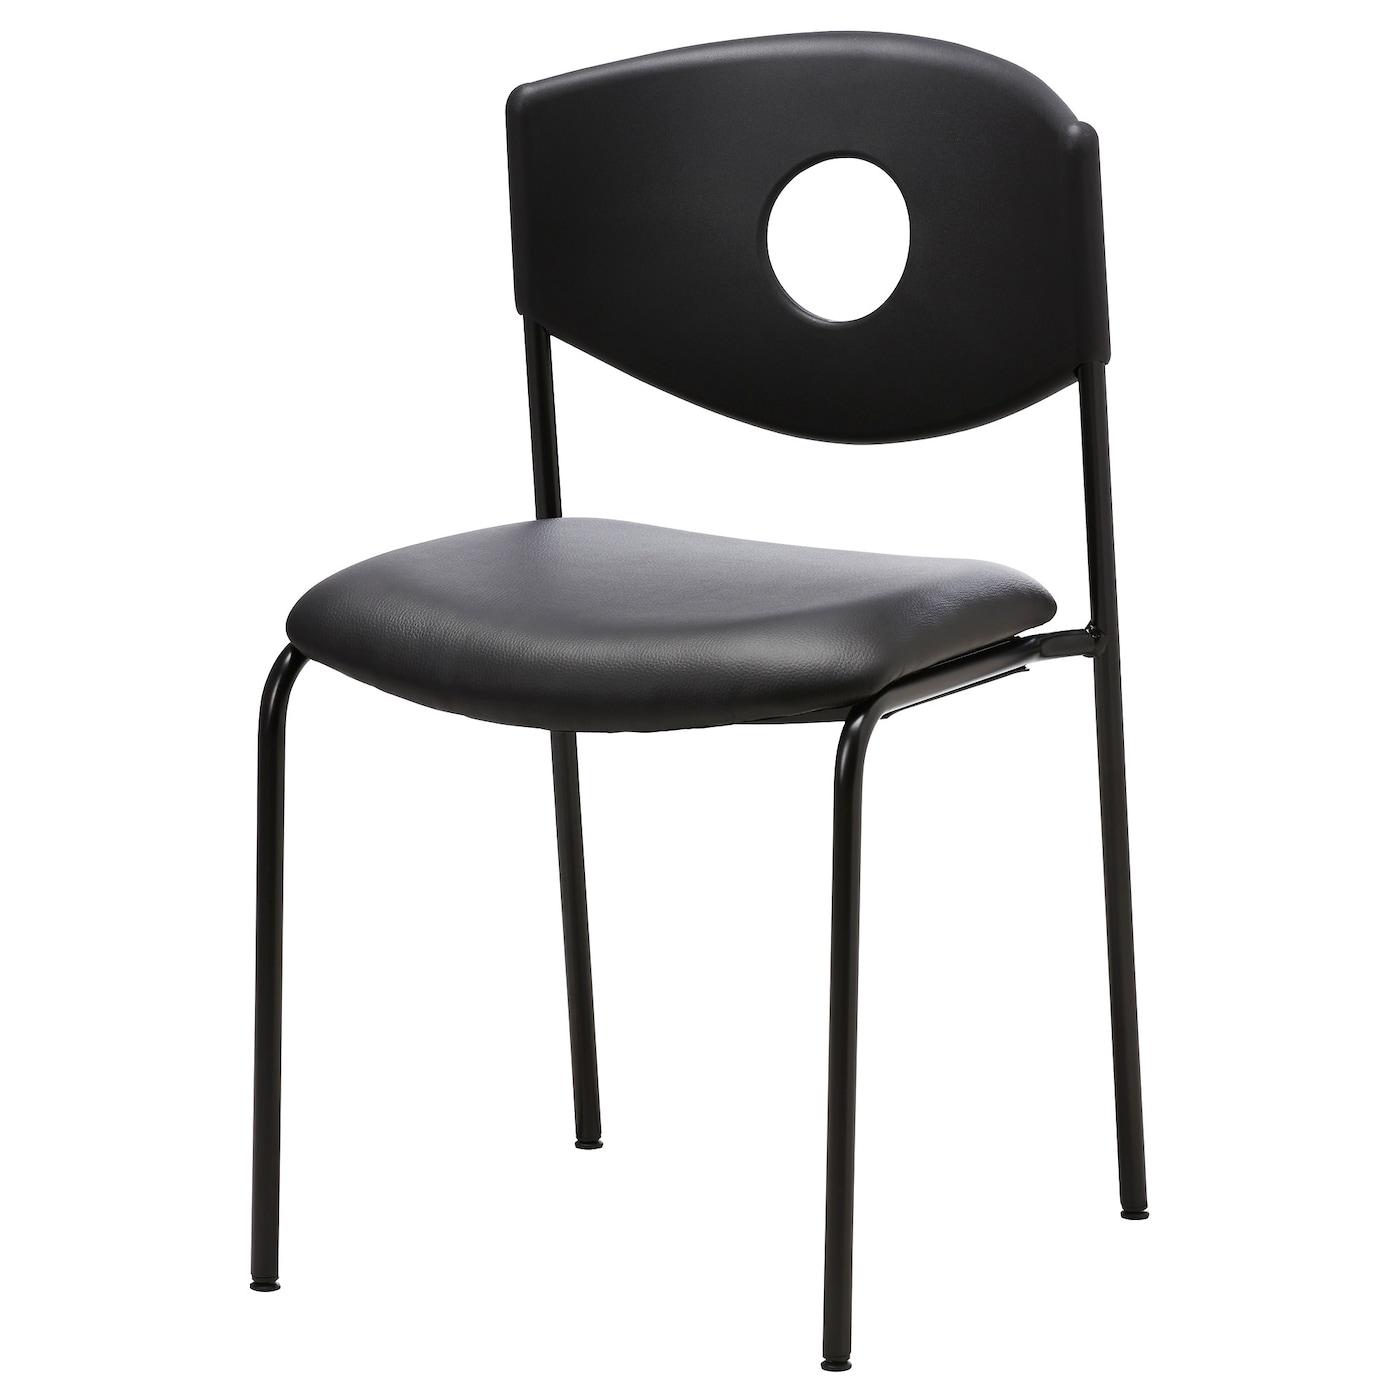 stoljan chaise conf rence noir noir ikea. Black Bedroom Furniture Sets. Home Design Ideas